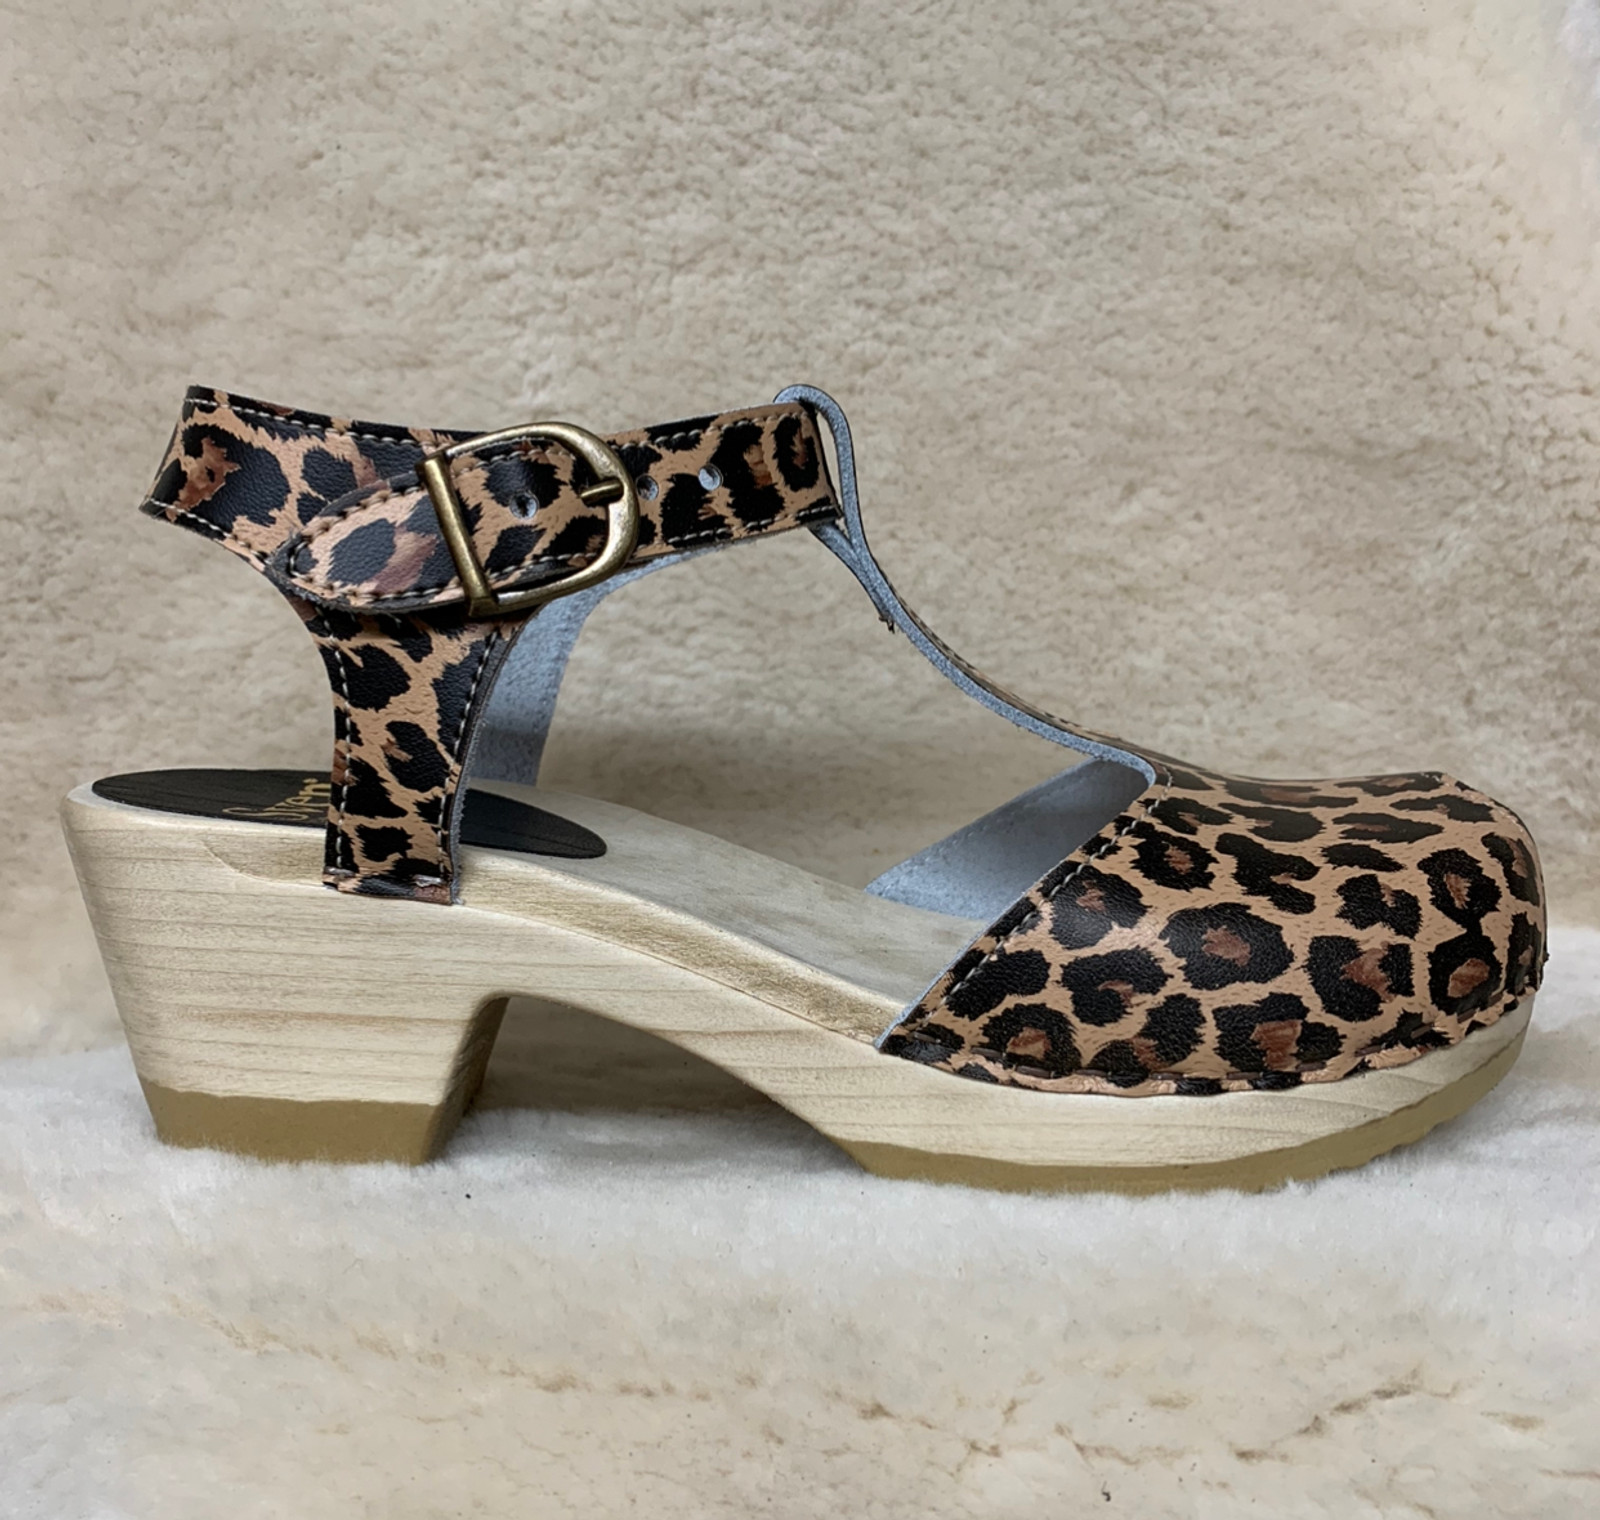 Leopard Print Clogs - T-Straps  - Mid Heels